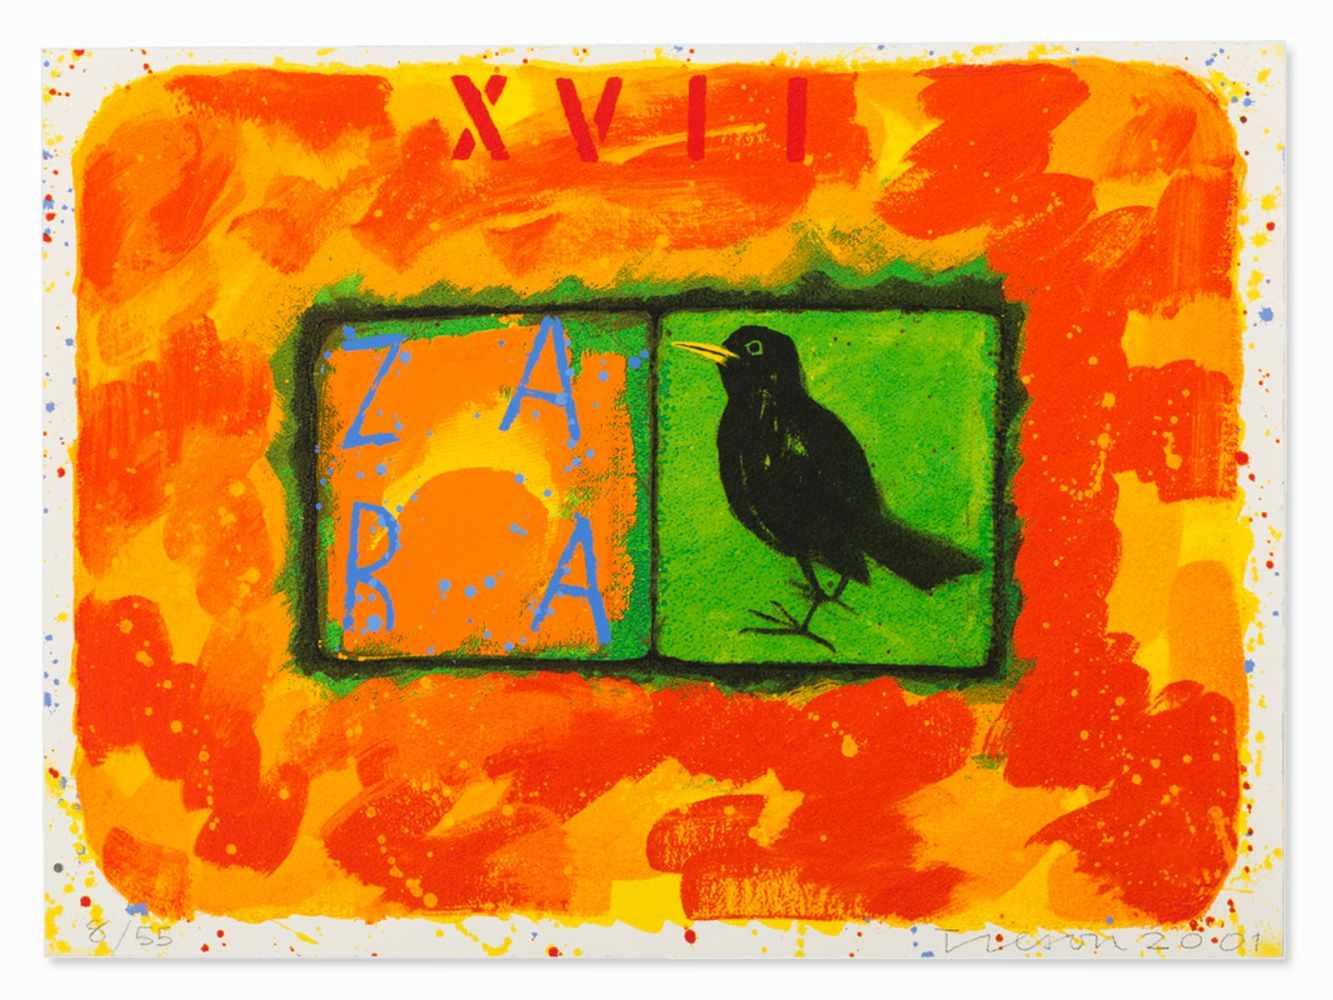 Joe Tilson, Conjunctions, 3 Serigraphs in Colors, 2001 - Image 4 of 7